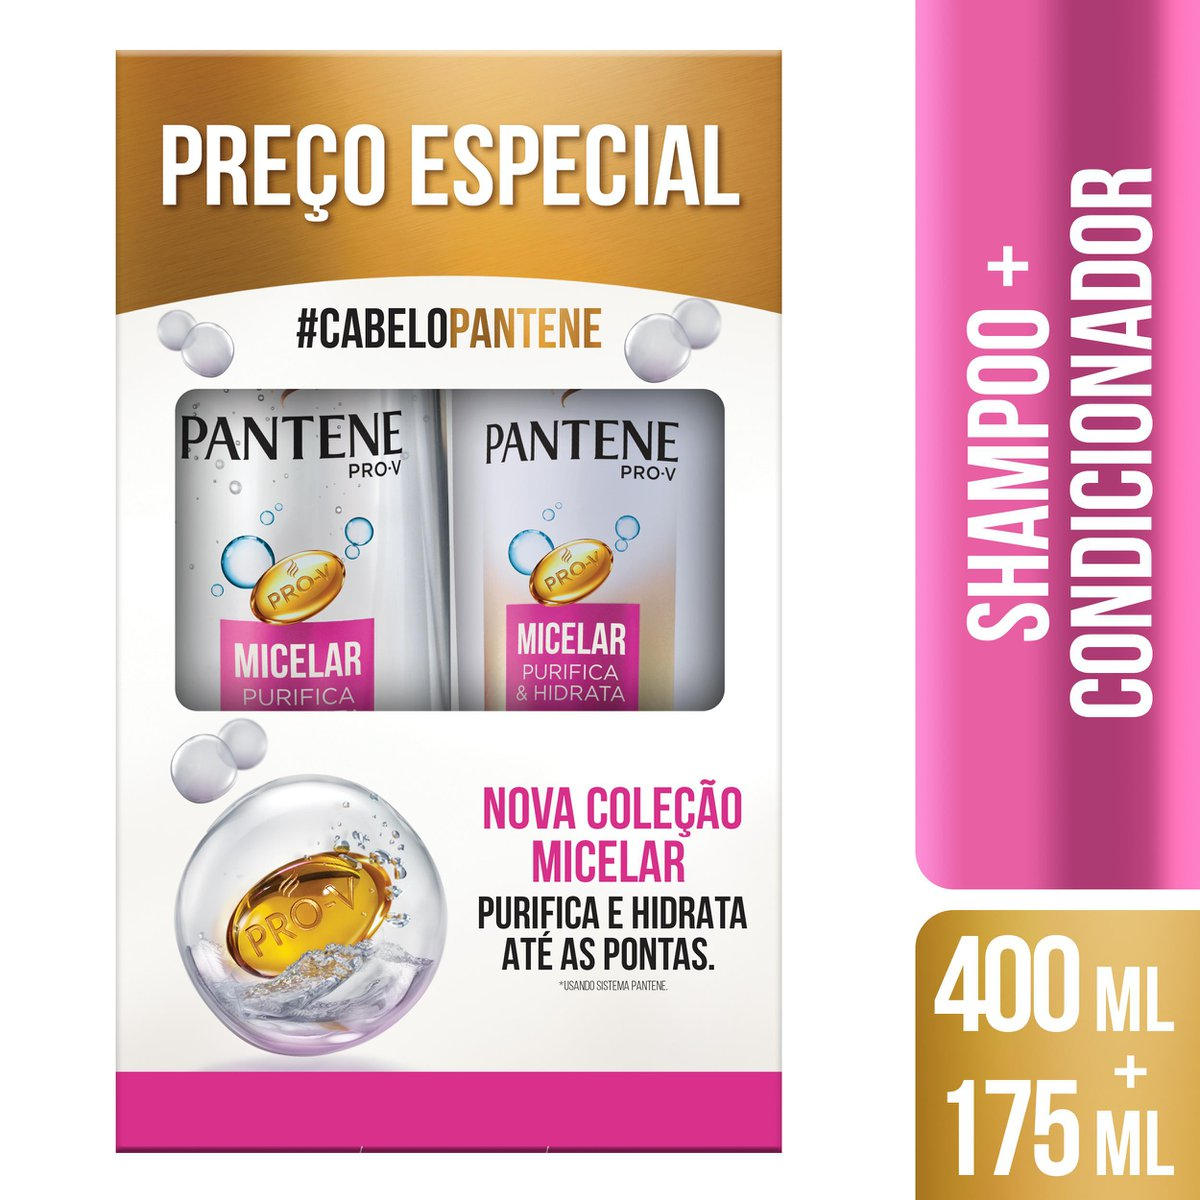 Pantene Kit Micelar Shampoo 400mL + Condicionador 175mL